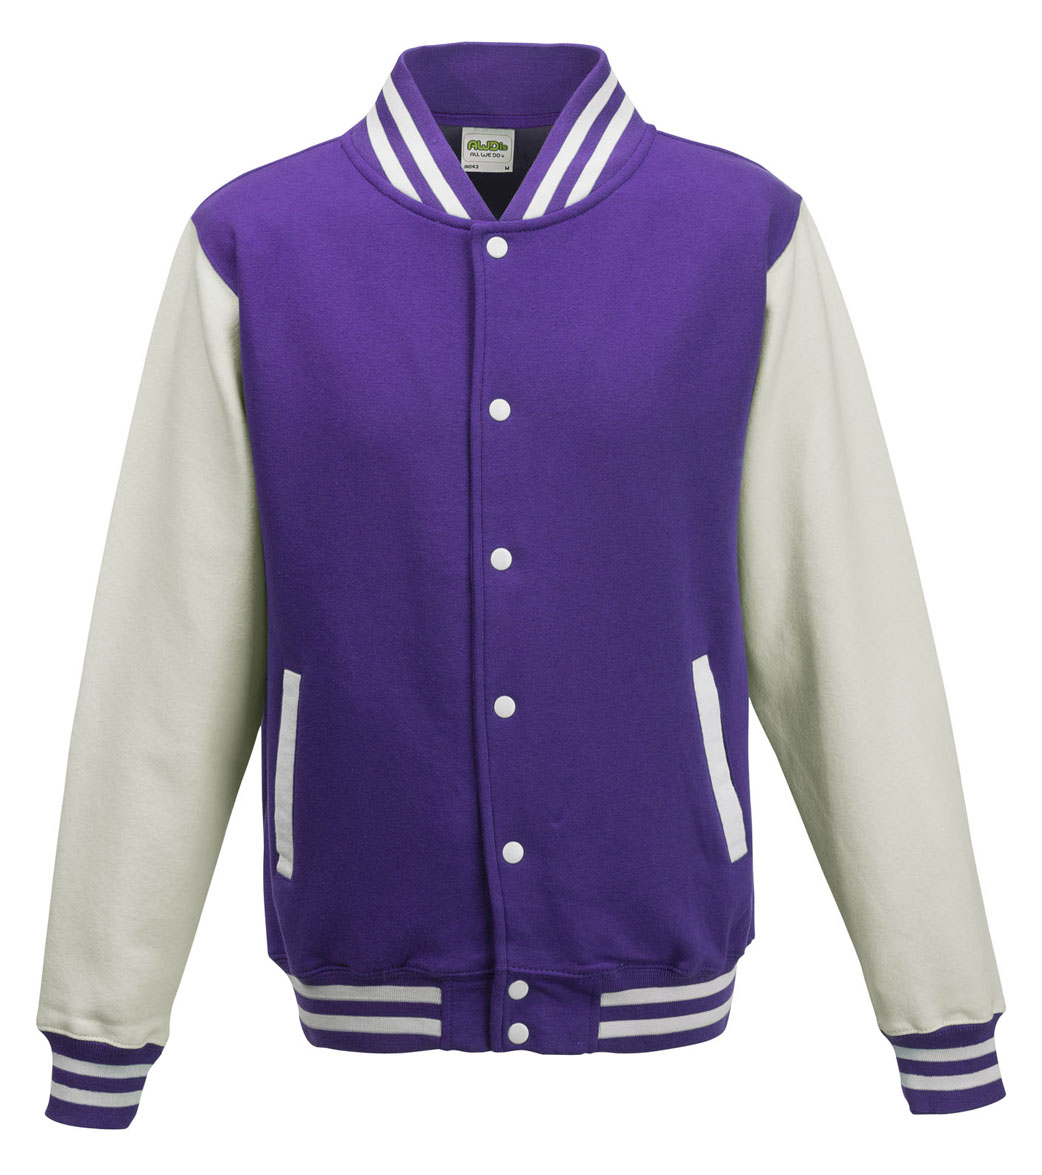 JH043 Purple - White